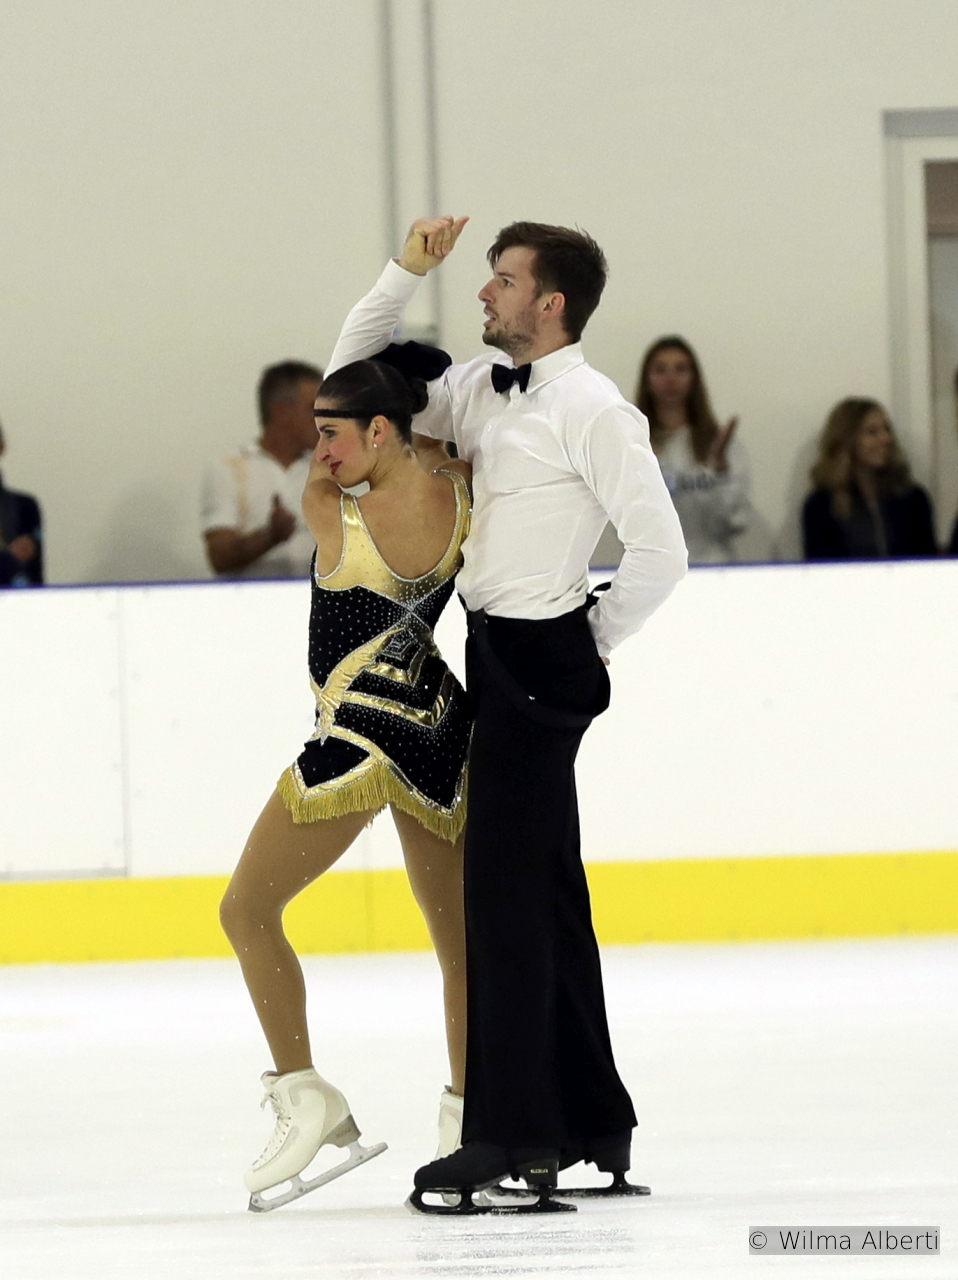 Valentina Marchei and Ondrej Hotarek SP (3)